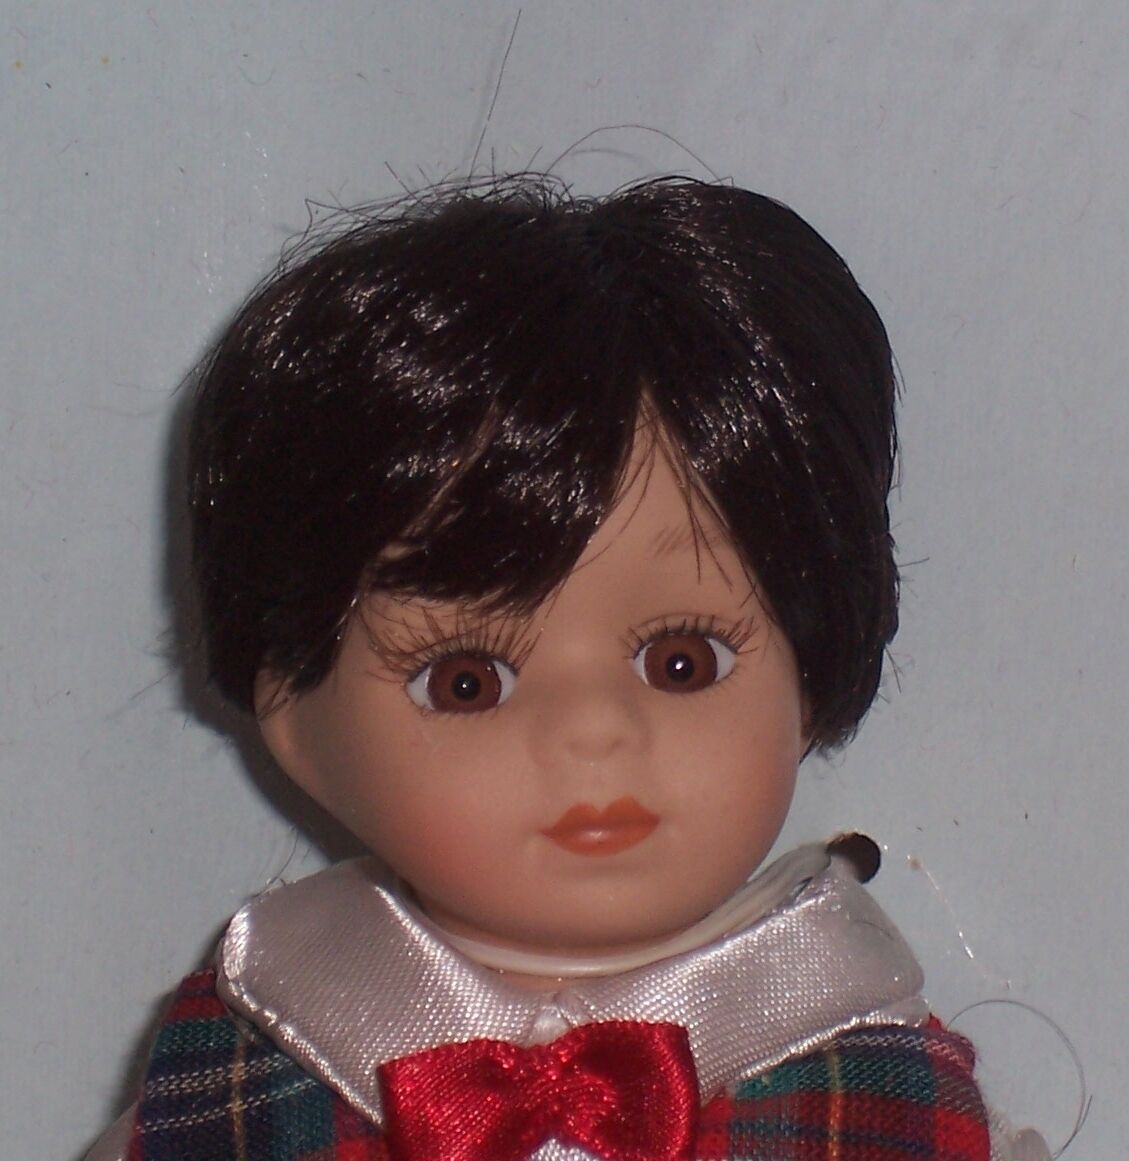 Marty & Mary Sunday Best Handcrafted Limited Ed Petite Porcelain Dolls NIB